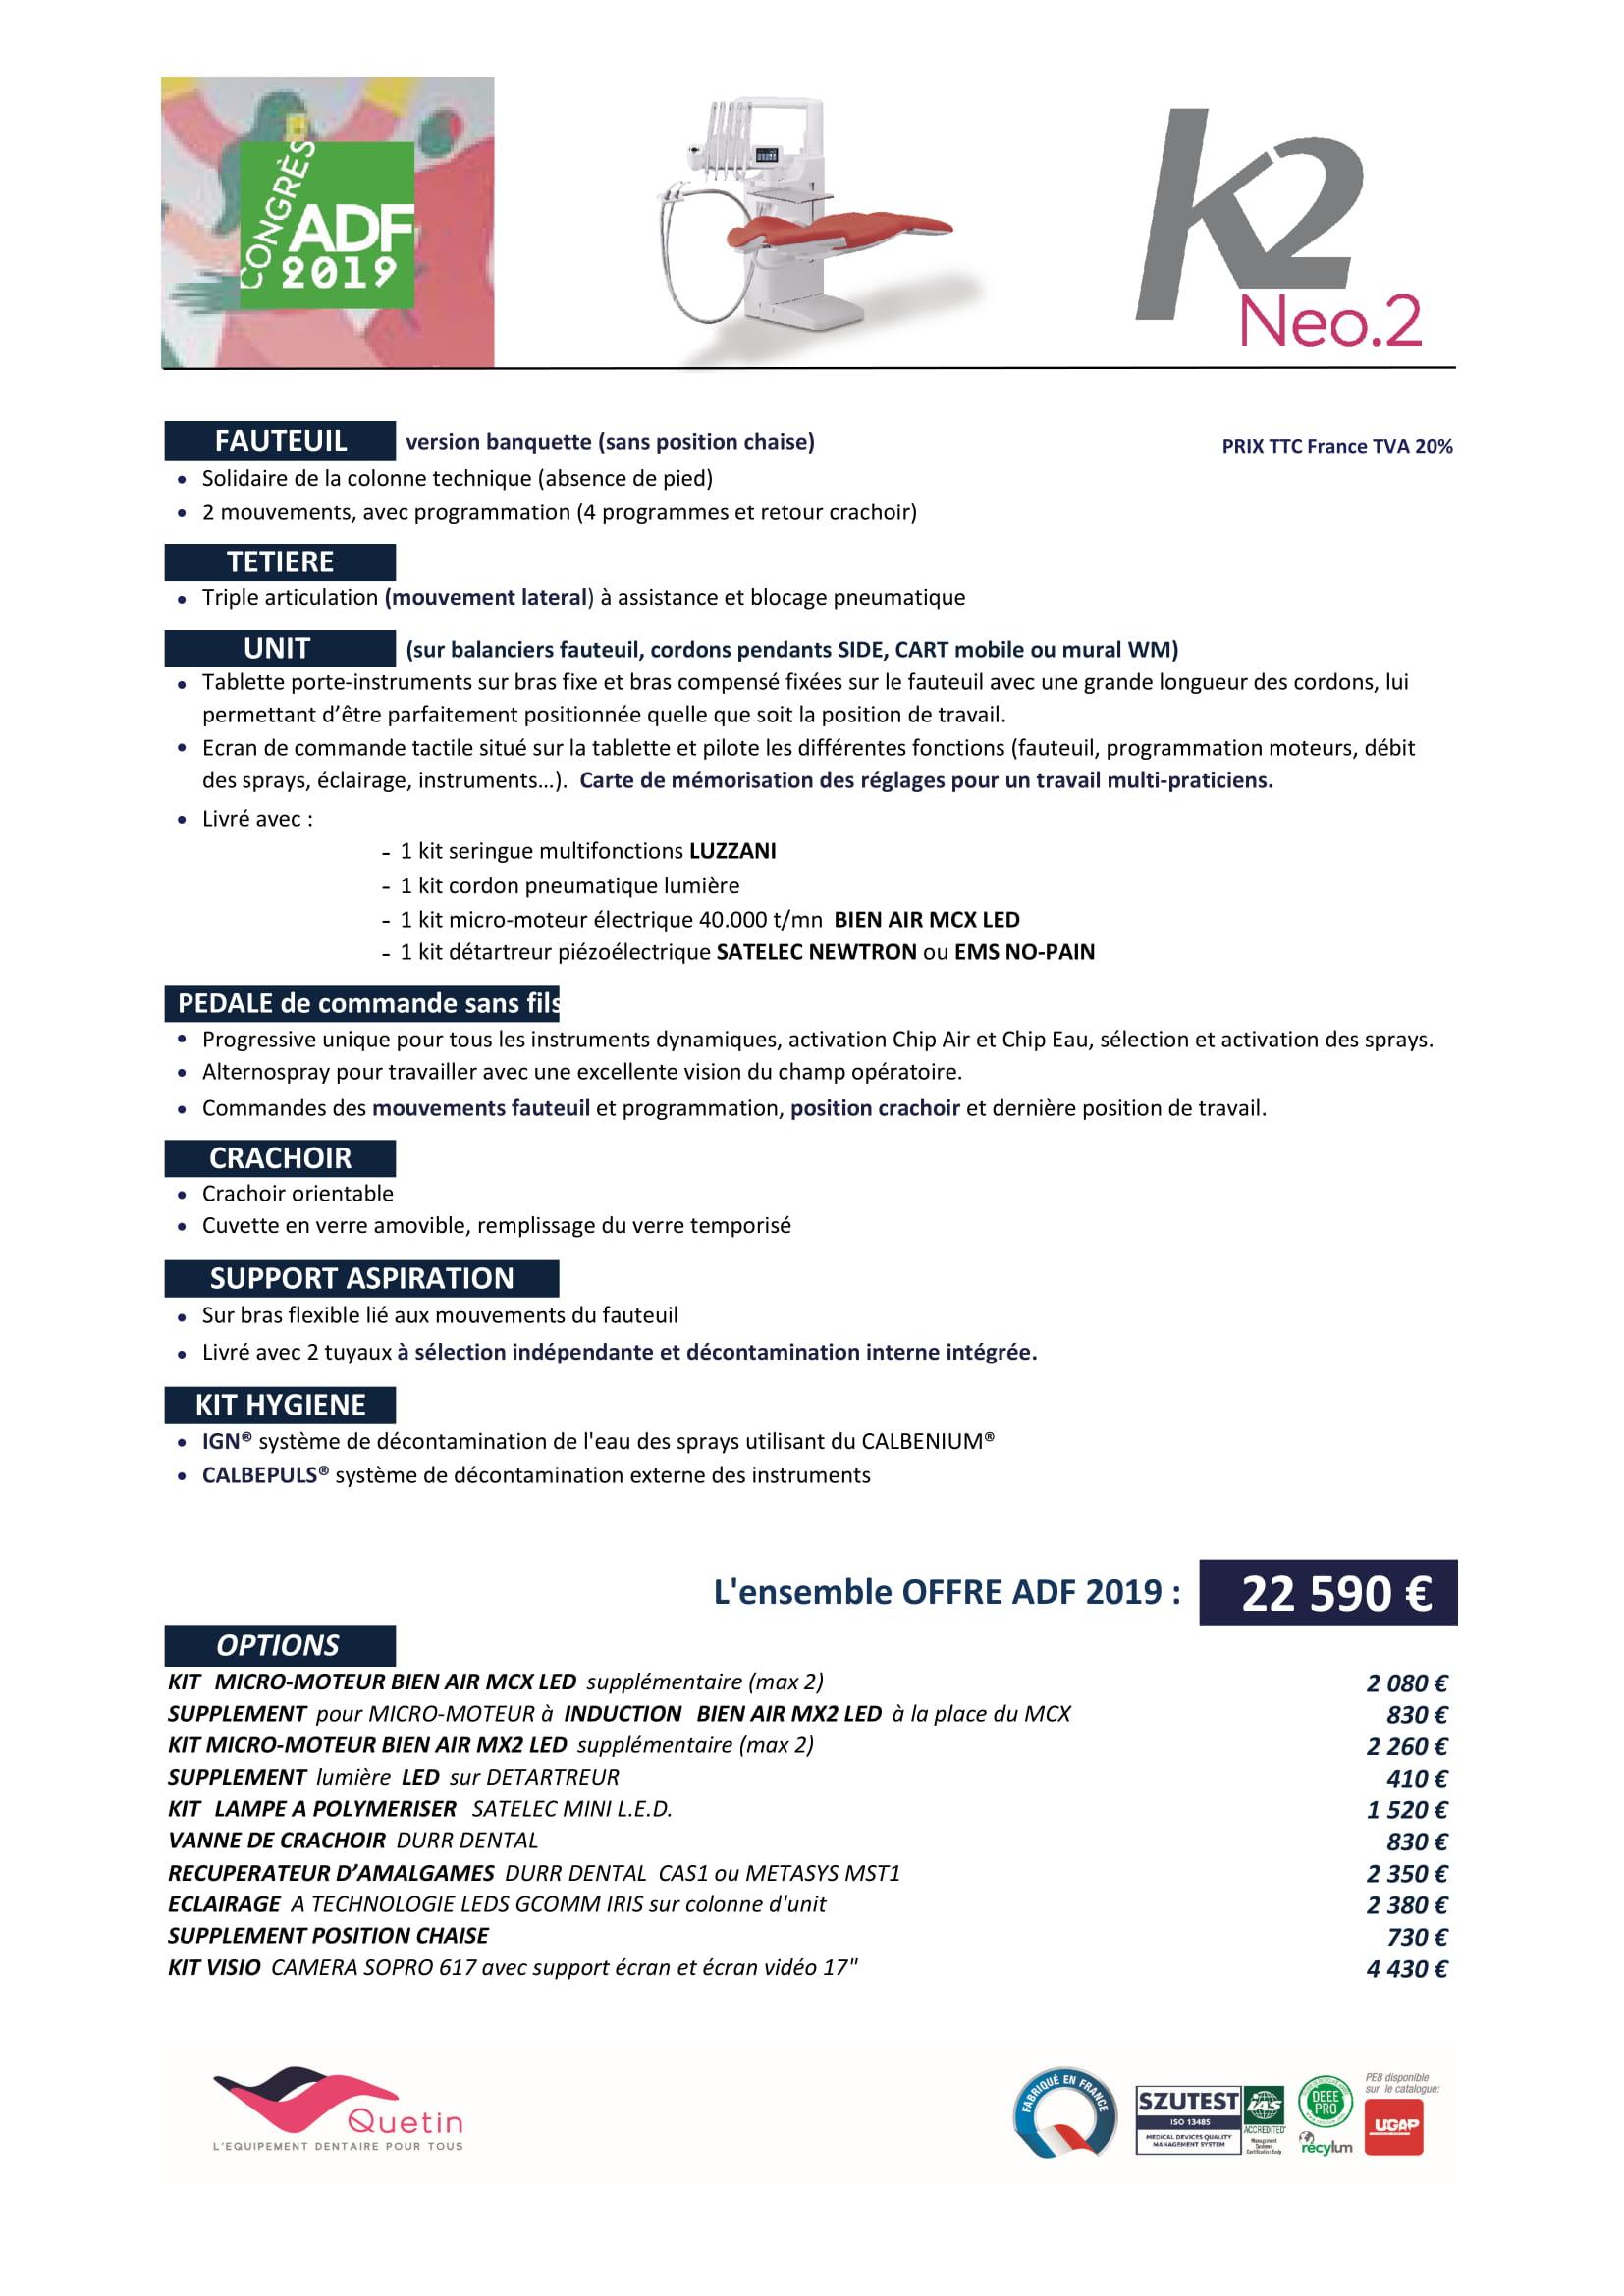 Offres ADF 2019